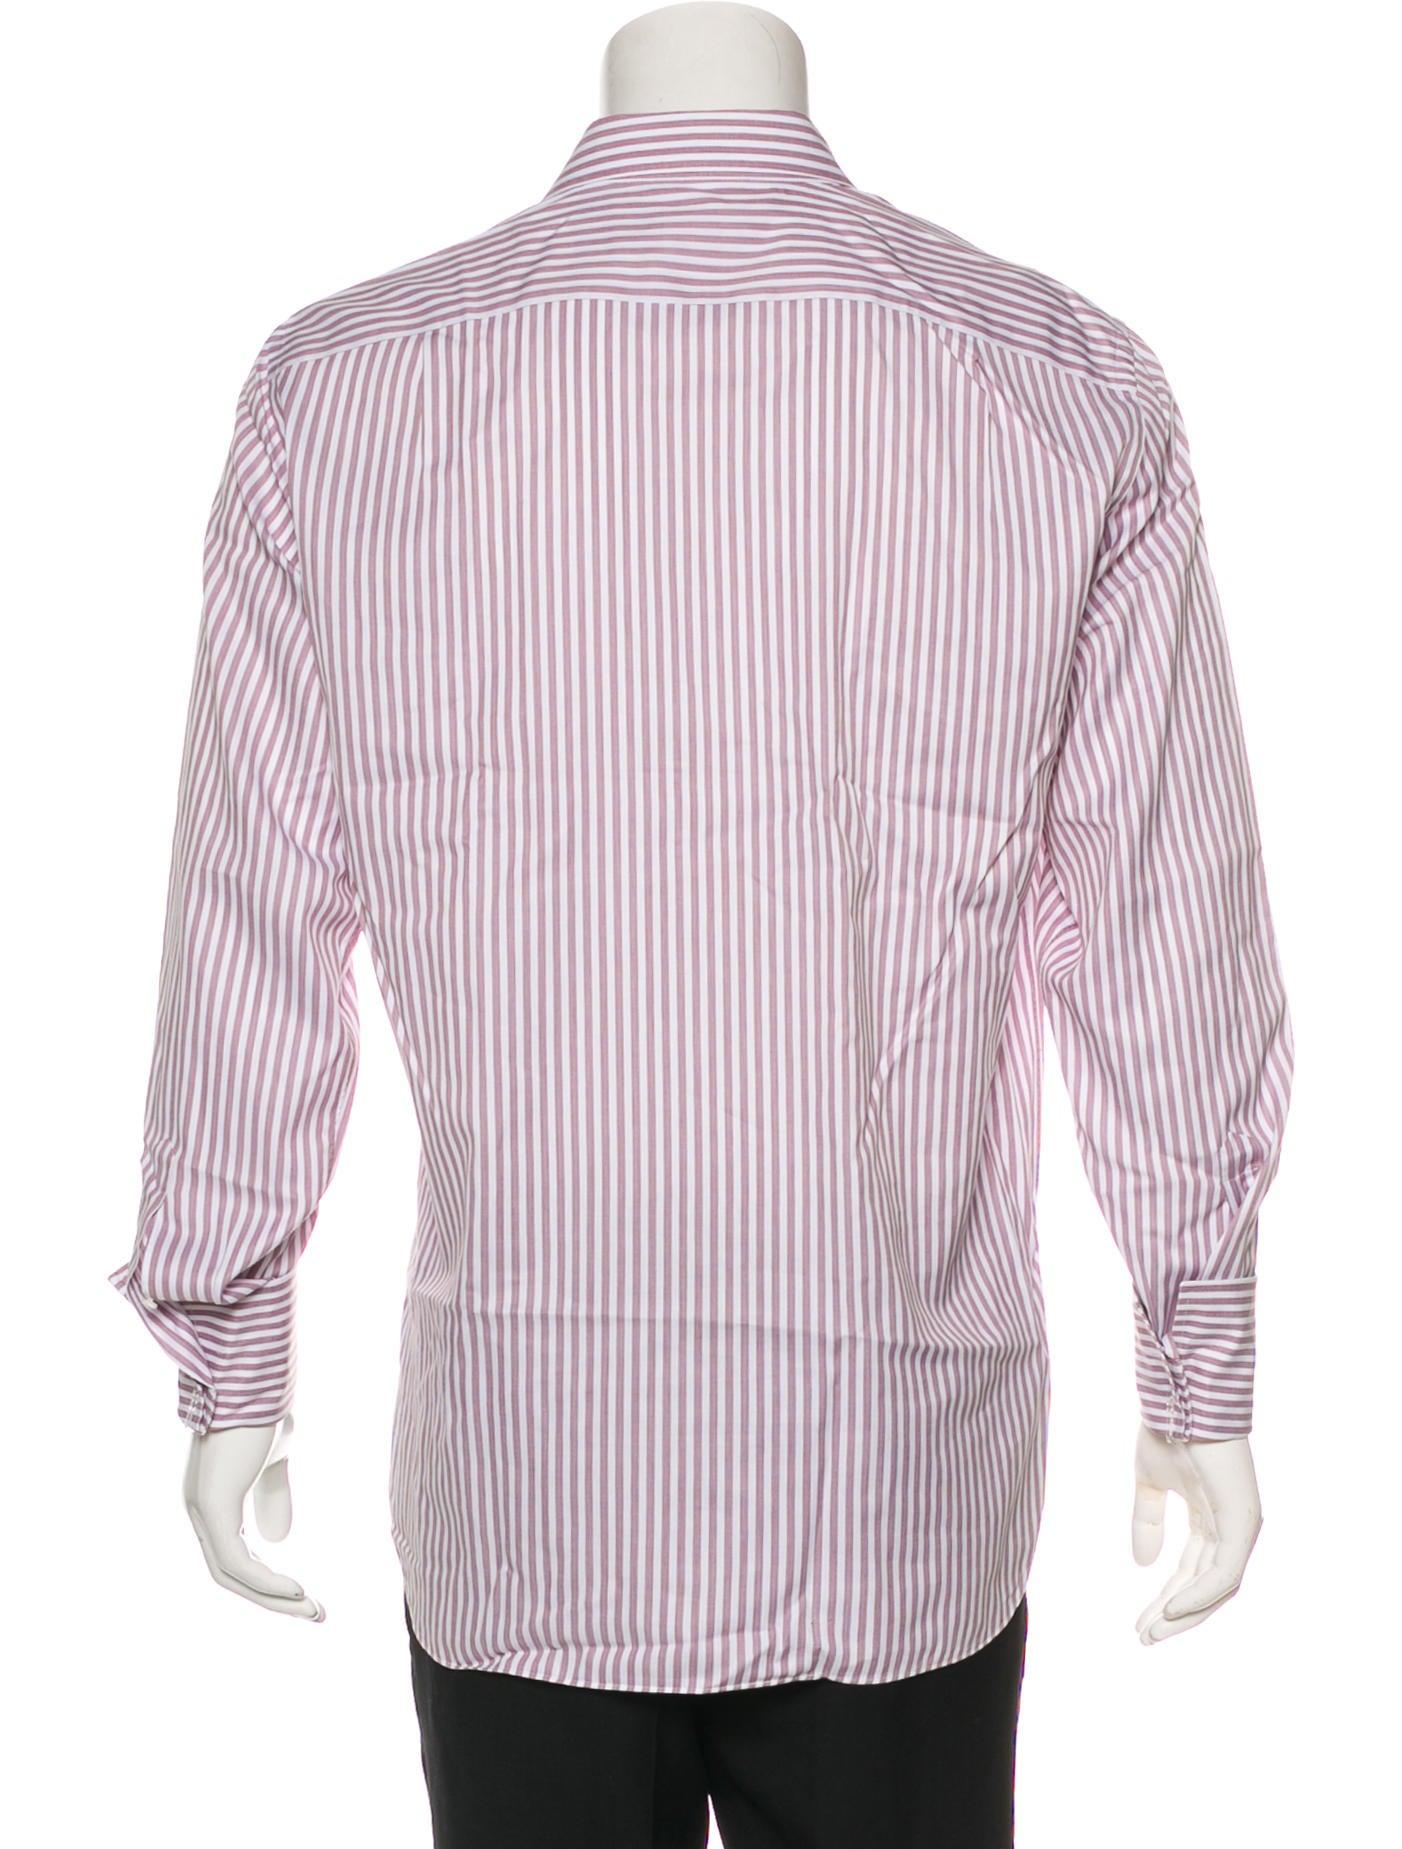 Ermenegildo Zegna French Cuff Dress Shirt Clothing Zgn28457